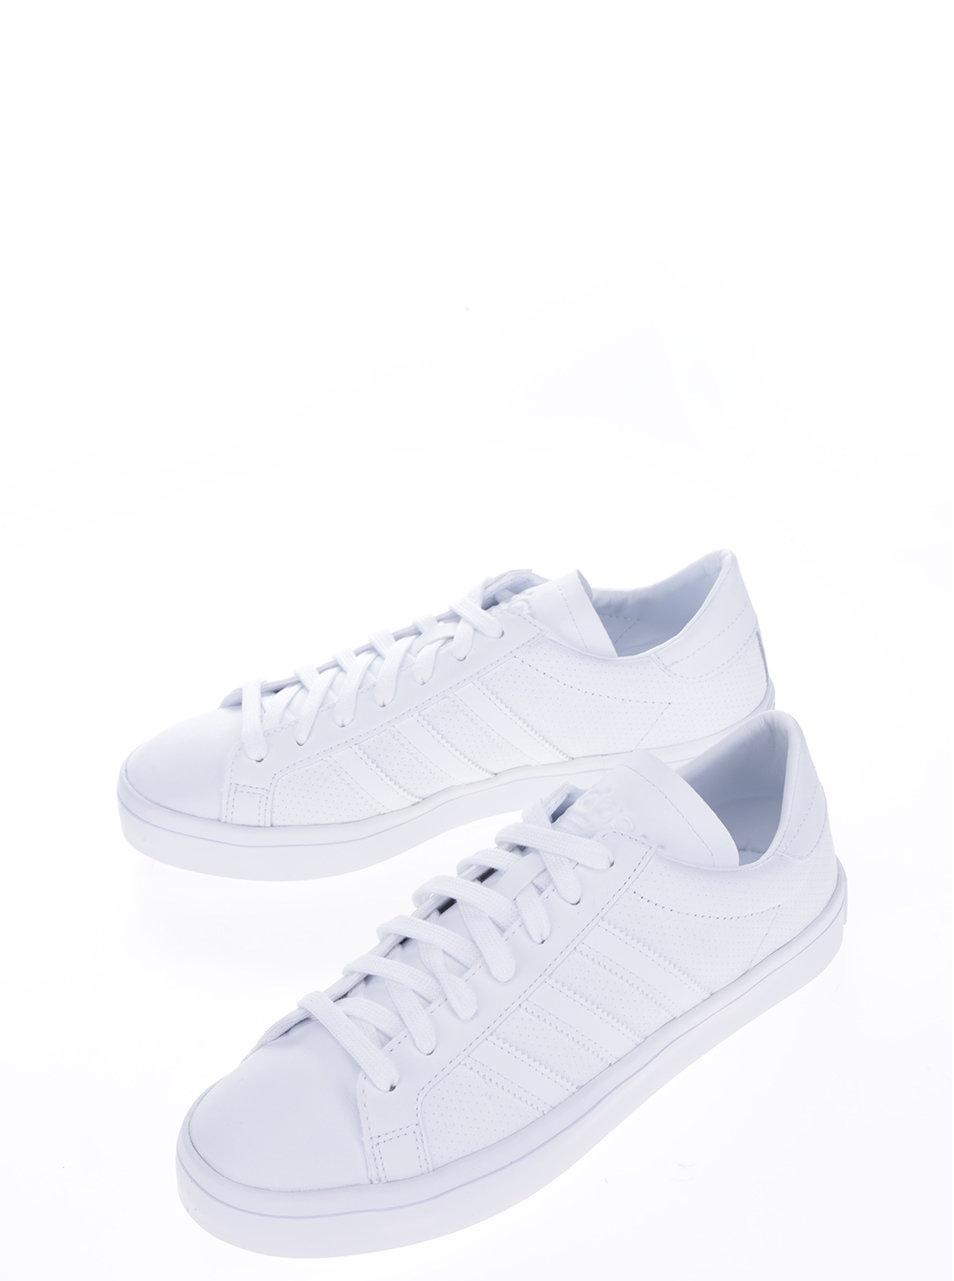 Biele pánske kožené tenisky adidas Originals Courtvantage ... dd4c68eda6a